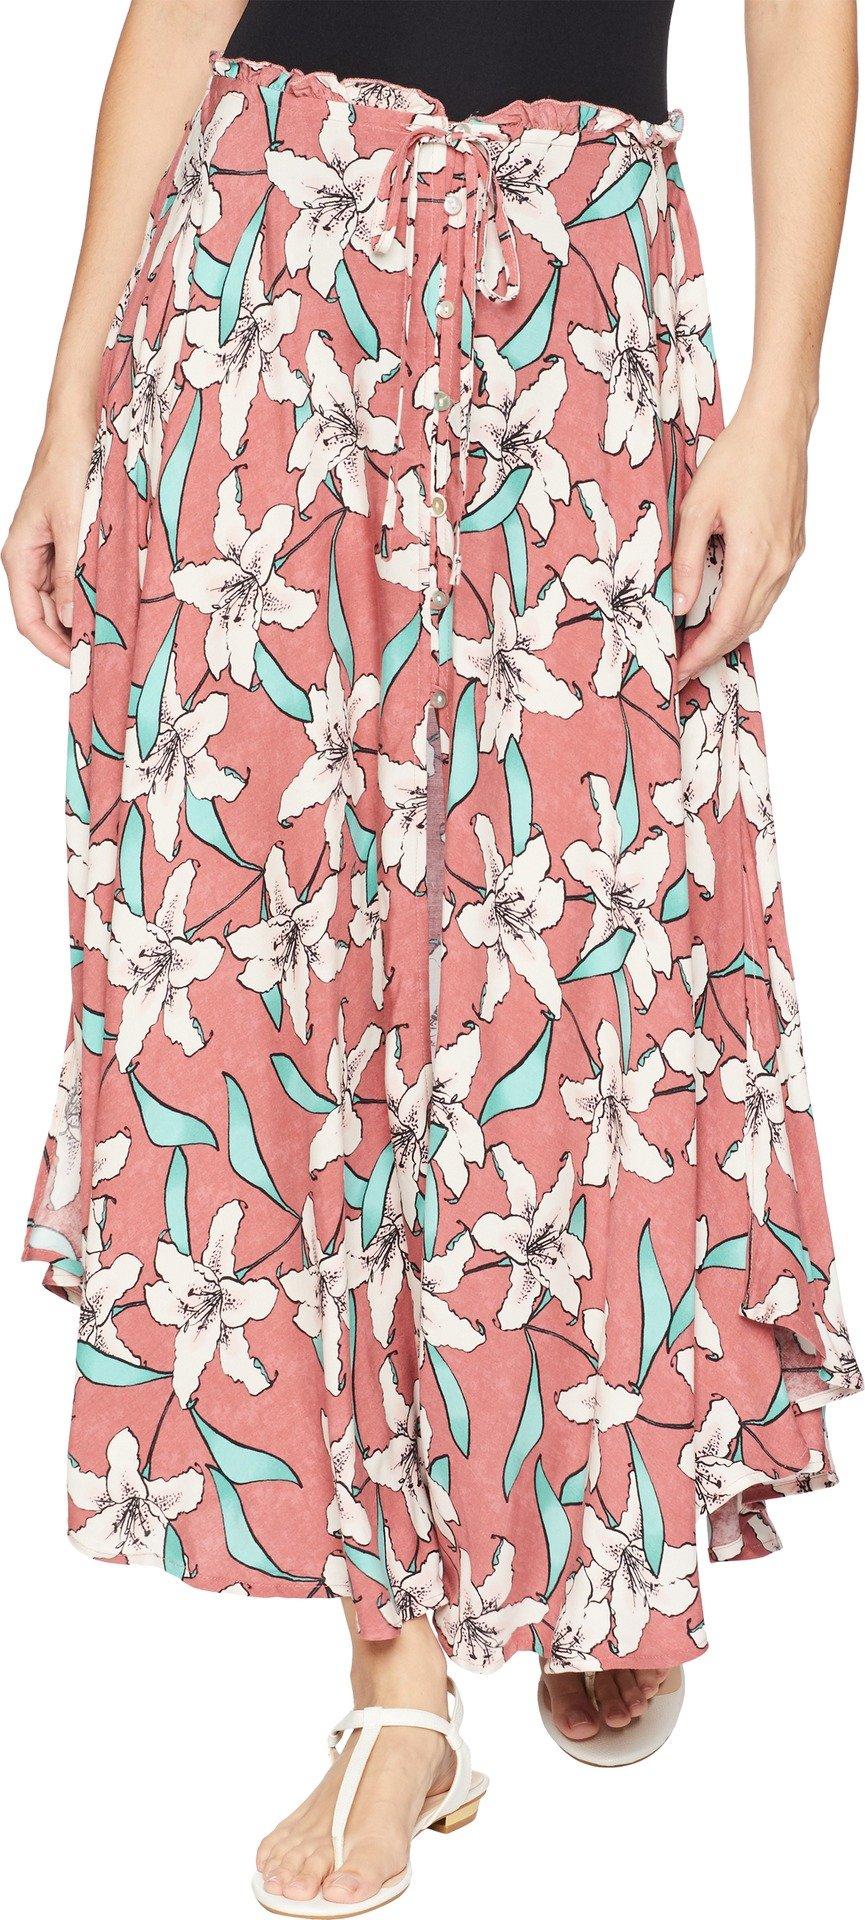 O'Neill Women's Kalani Skirt, Withered Rose, L